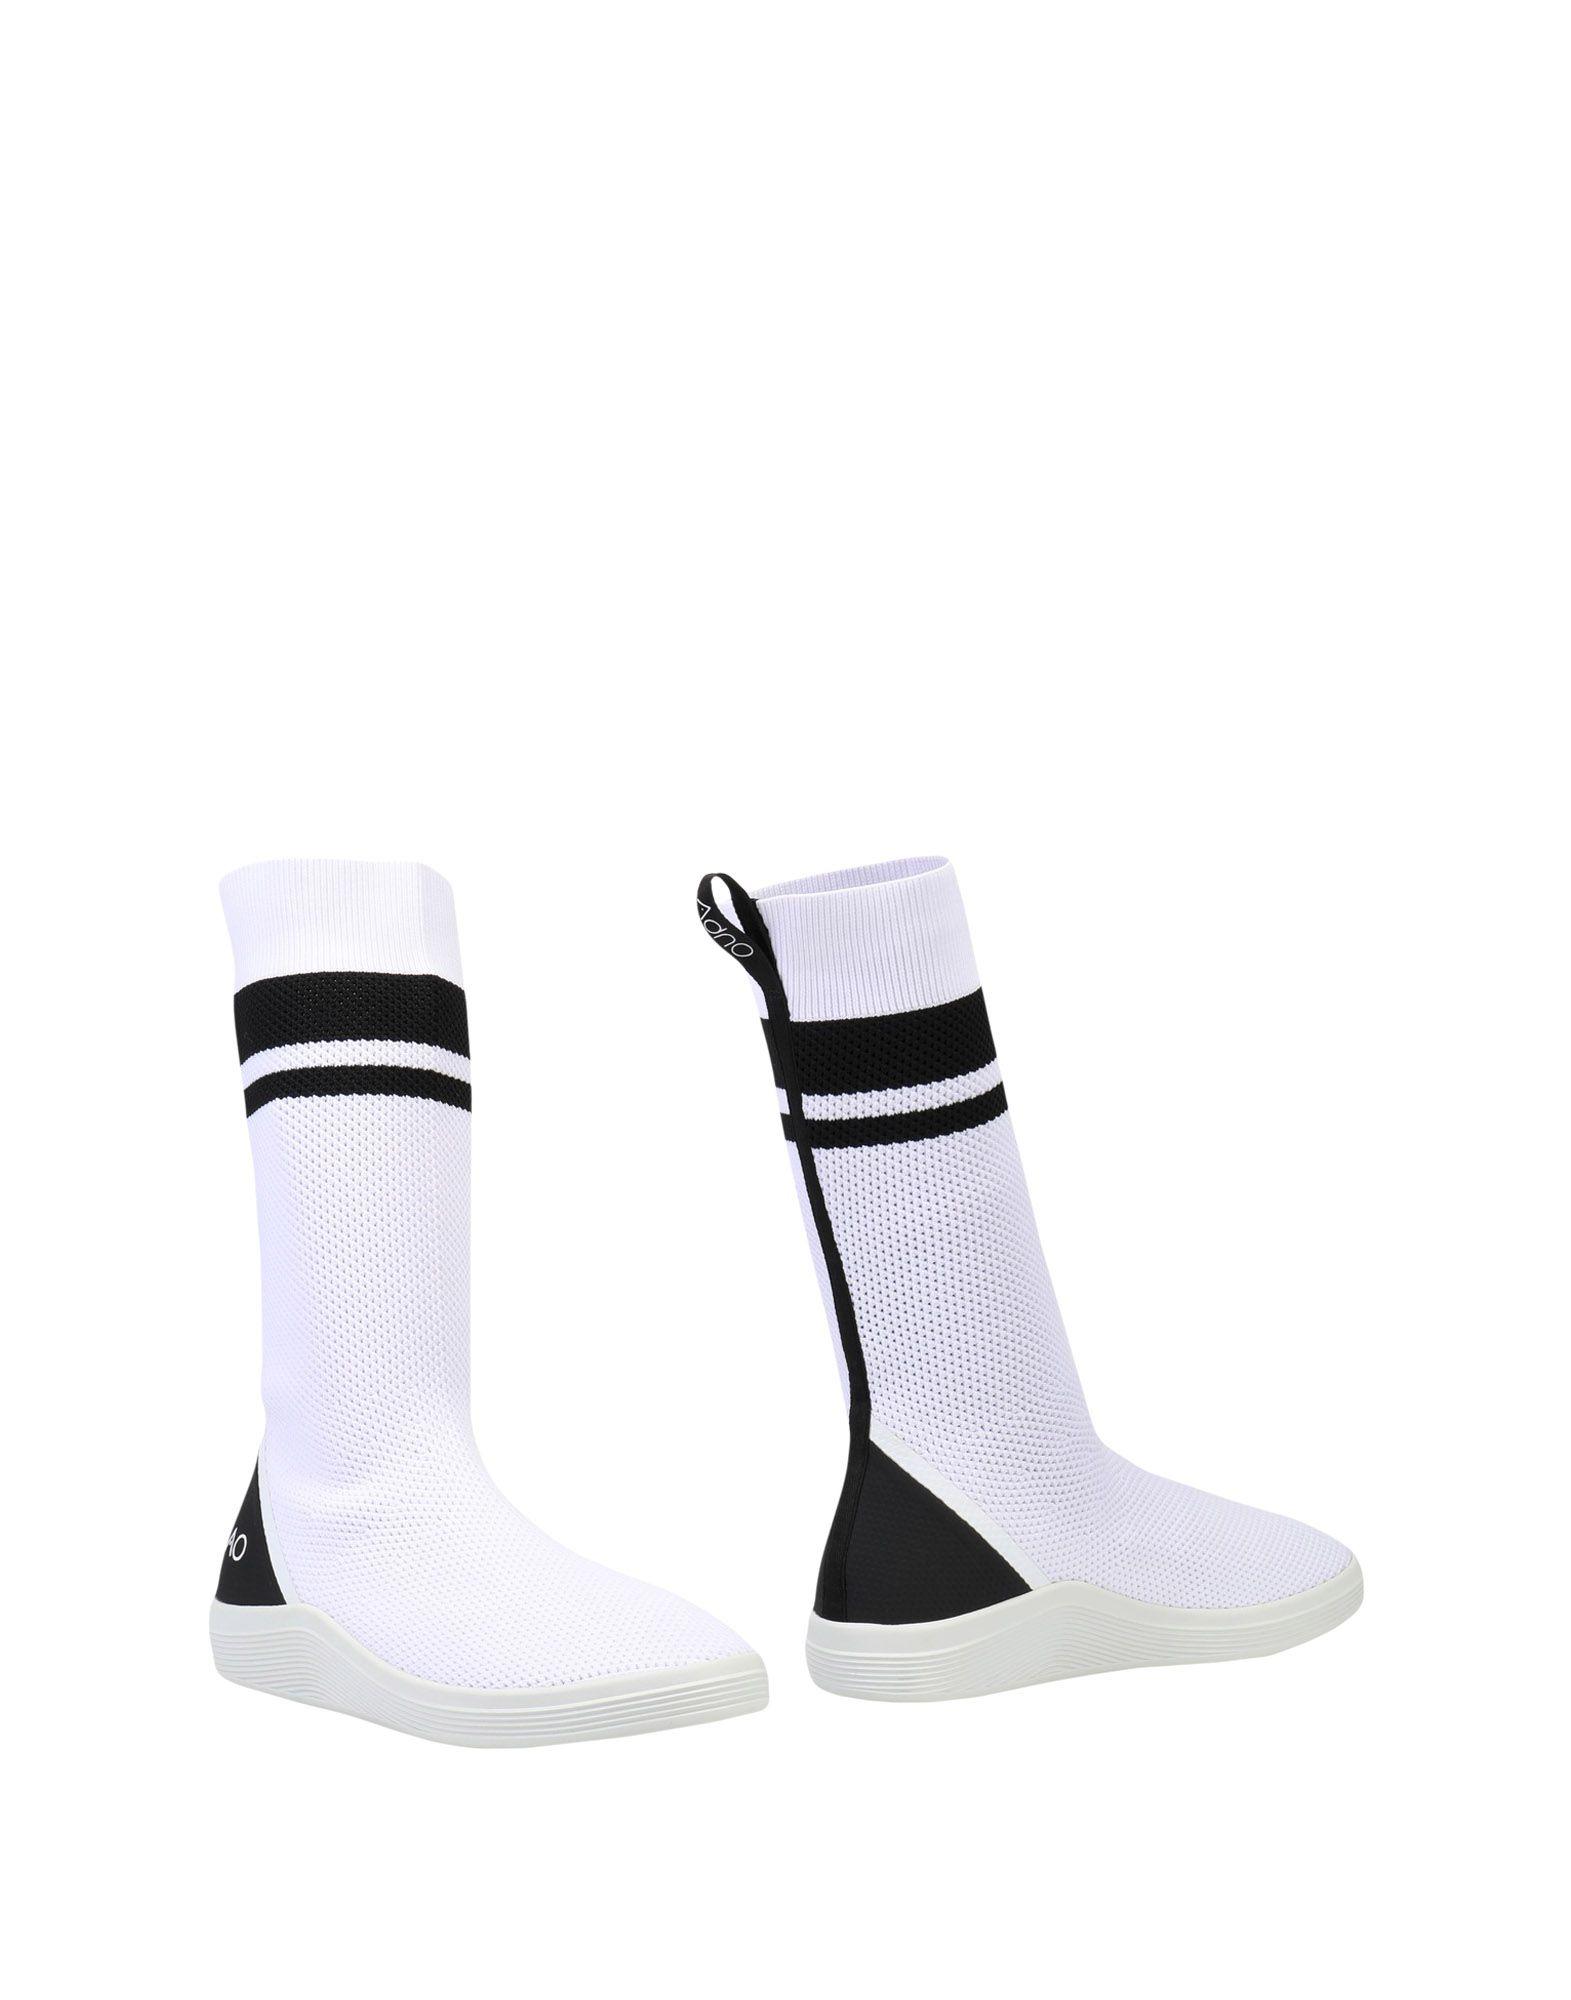 ADNO &Reg; Boots in White